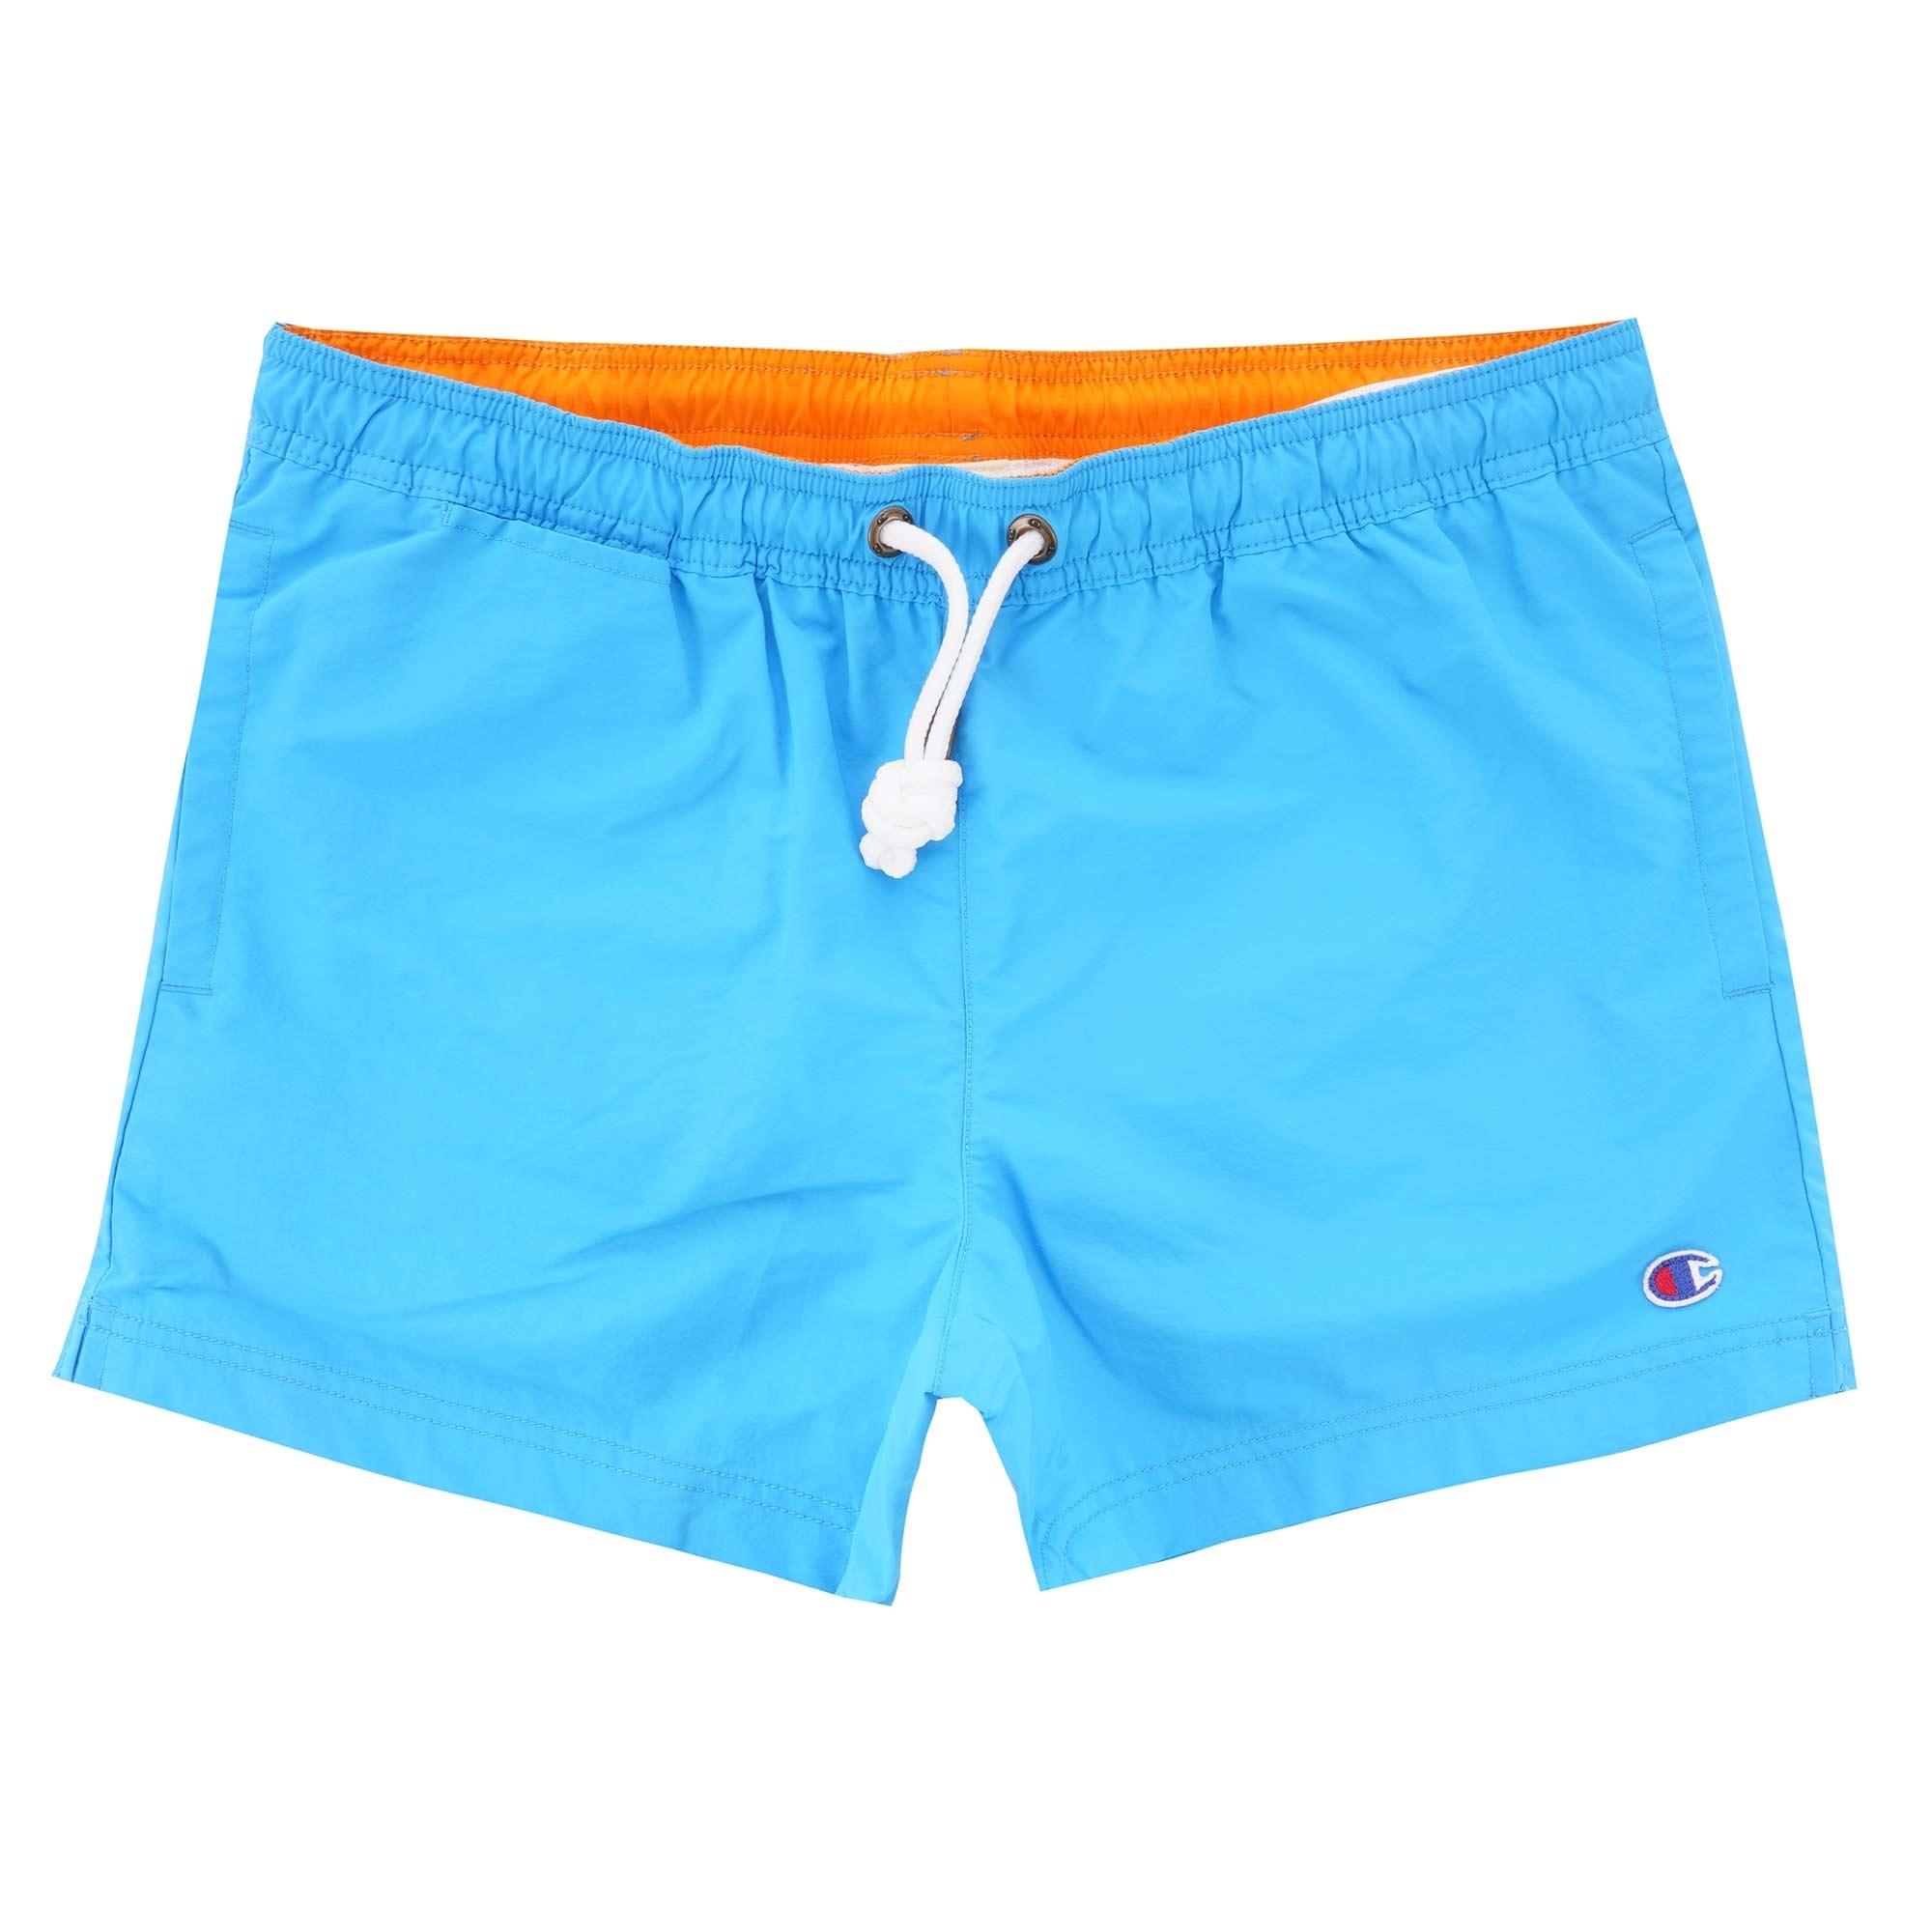 5178a45608 Champion Contrast Seam Detail Swim Shorts   Blue   213090BZ022